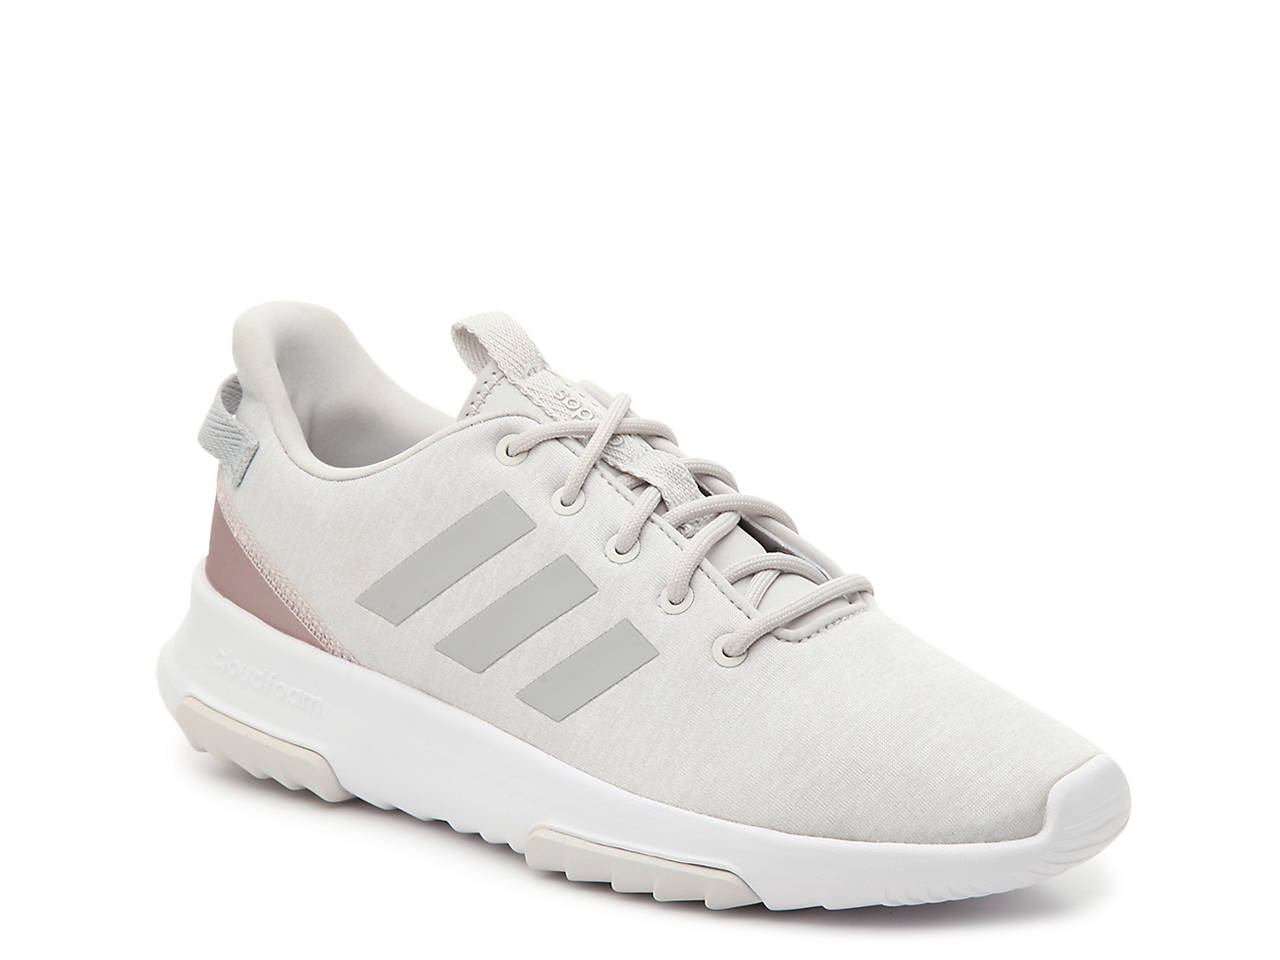 adidas cloudfoam women's sneakers